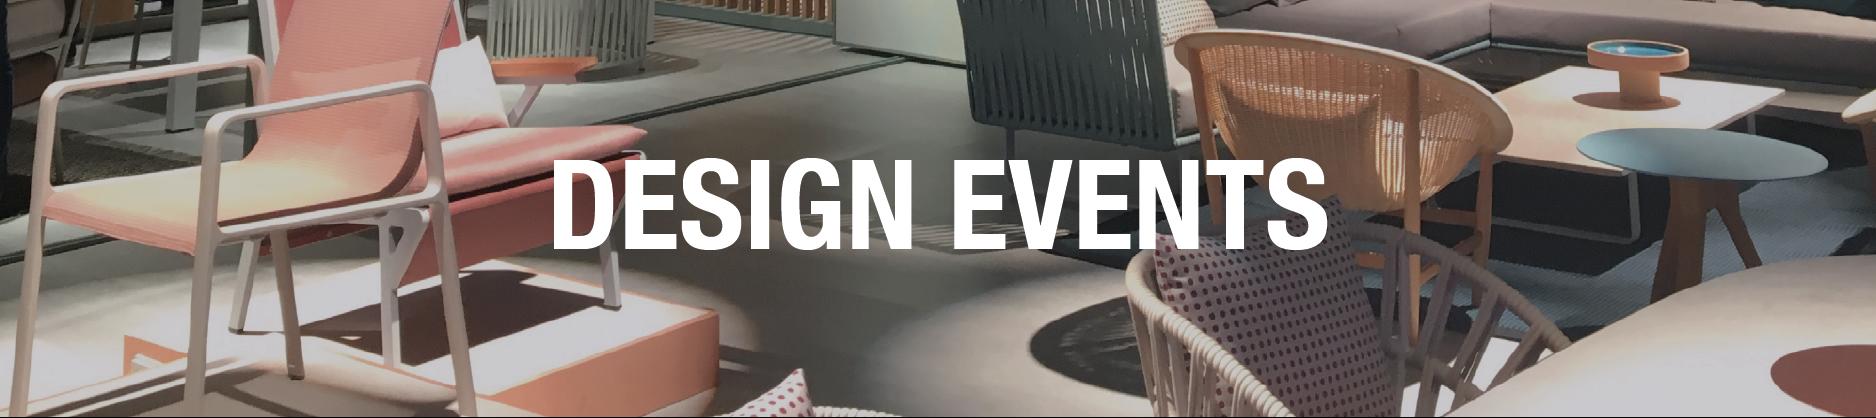 DesignEvents.png